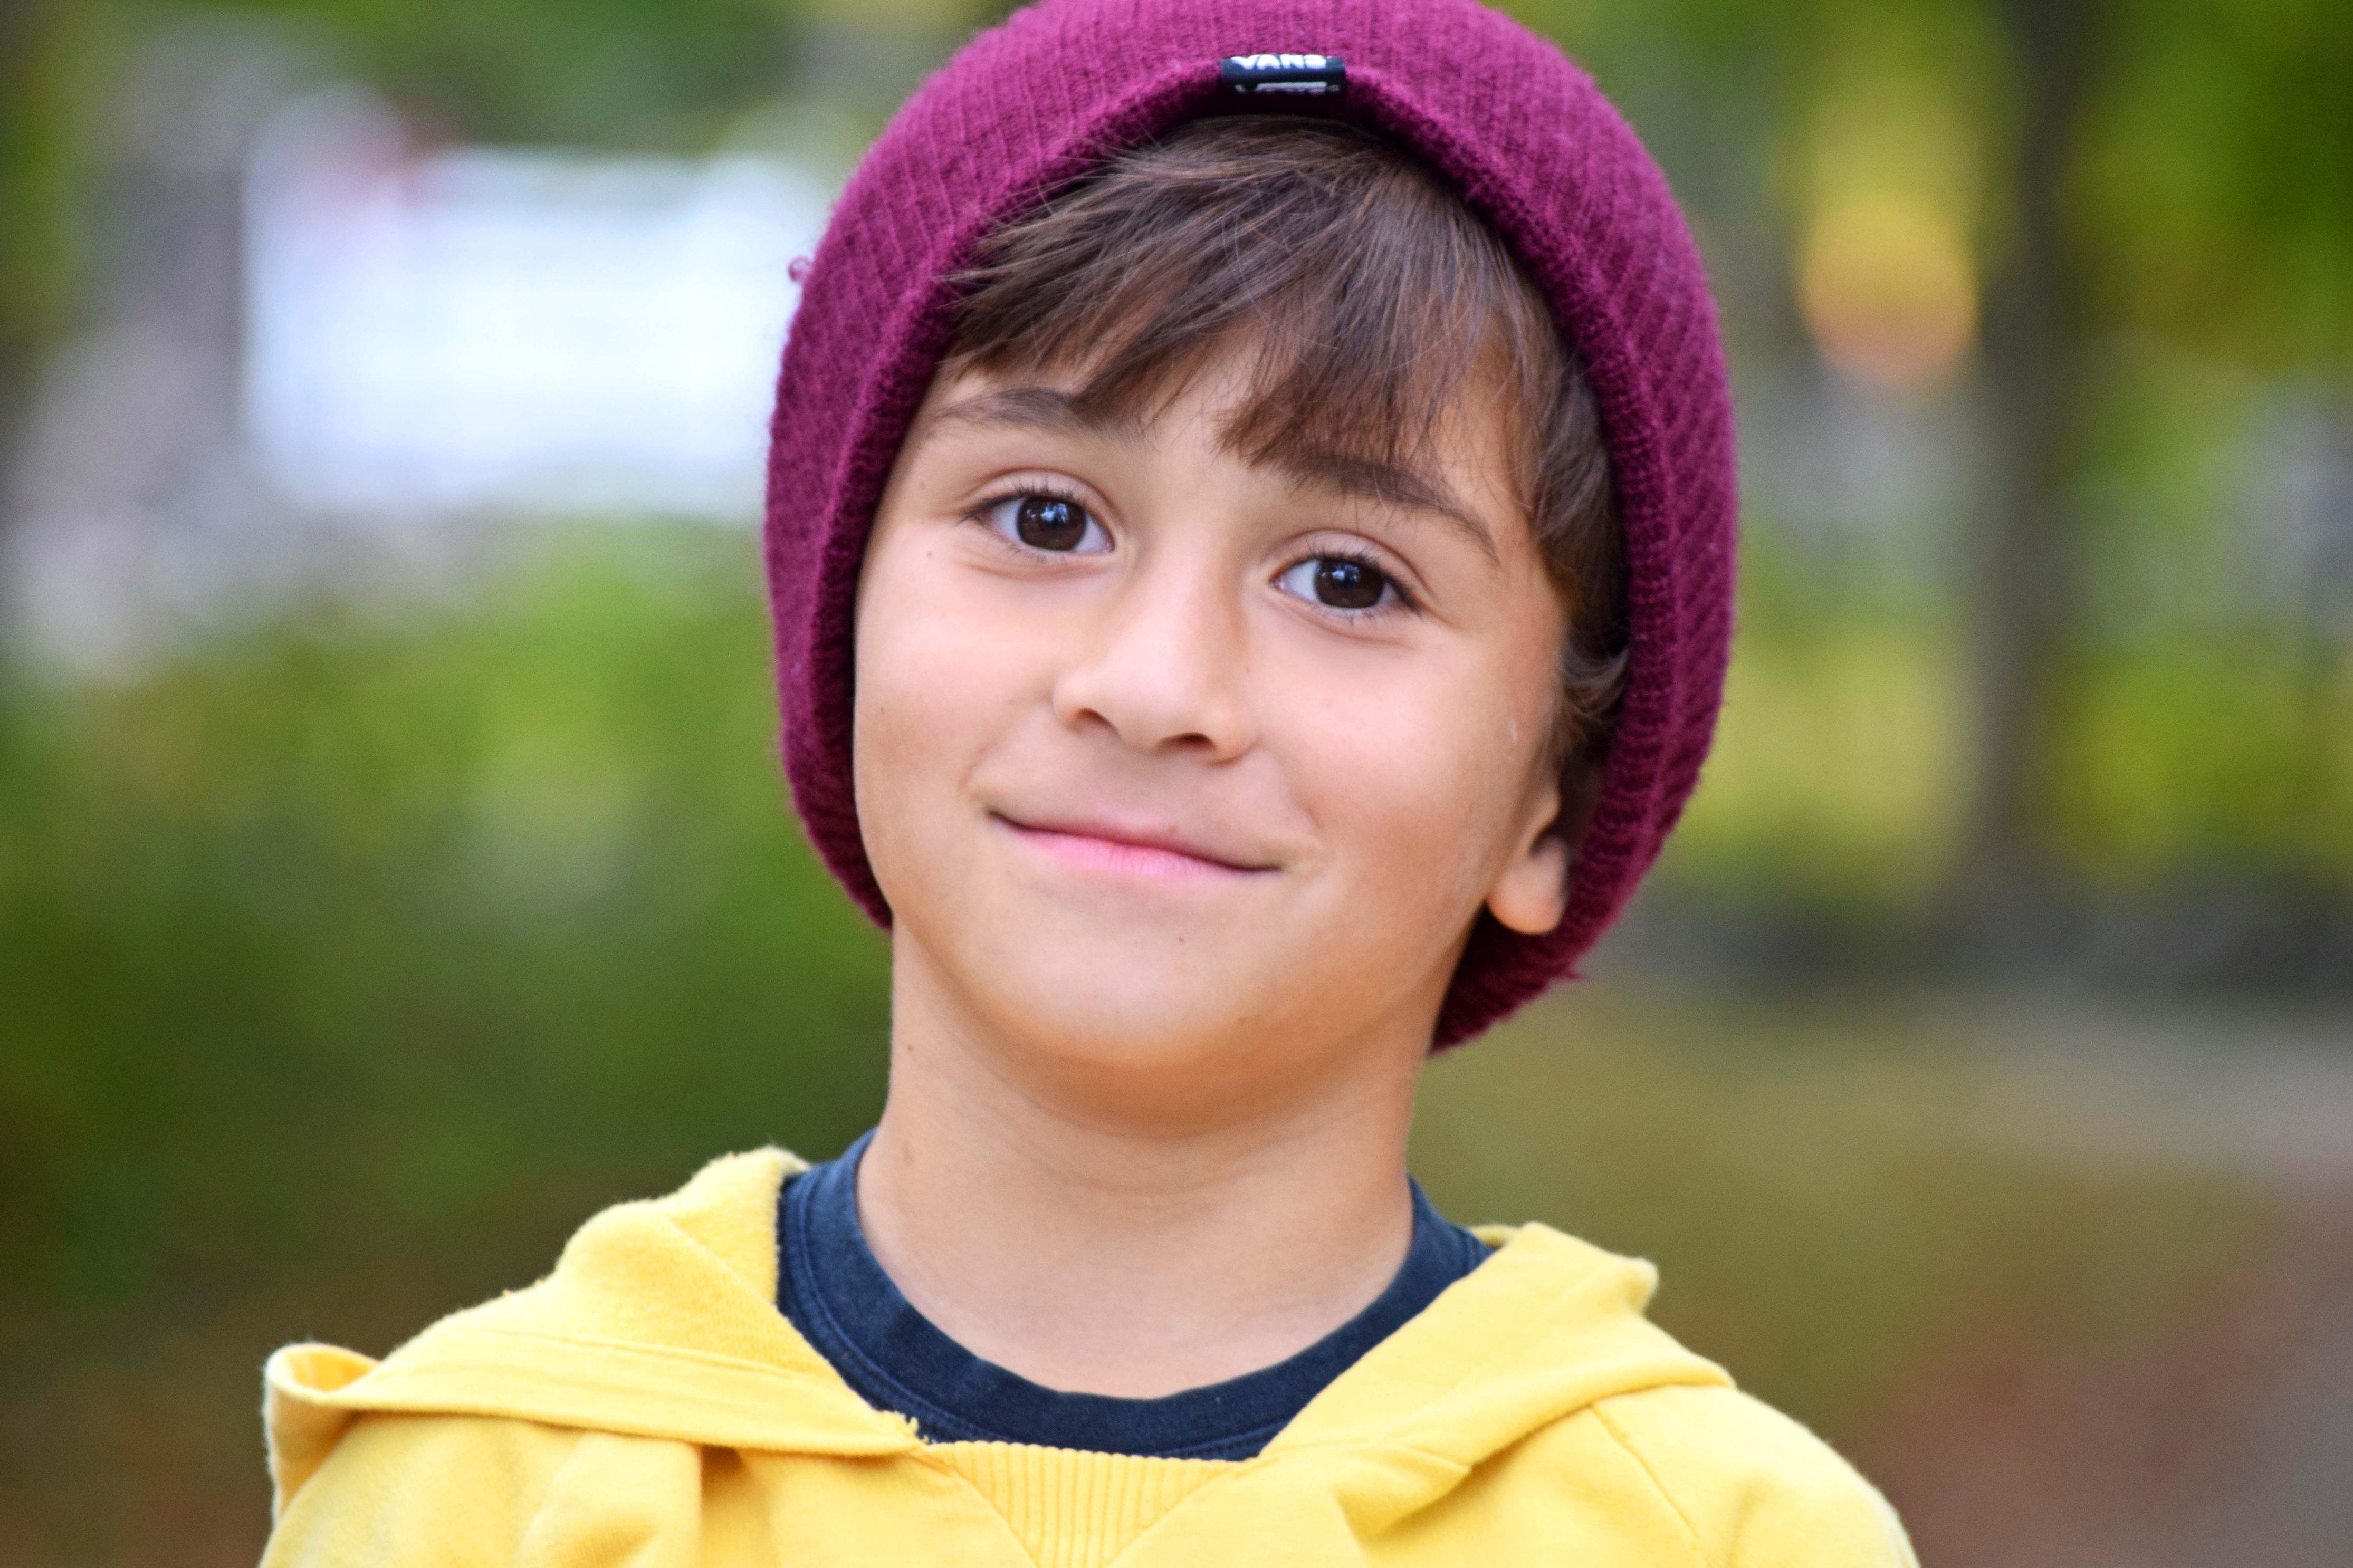 young-child-smirks%20%281%29.jpg